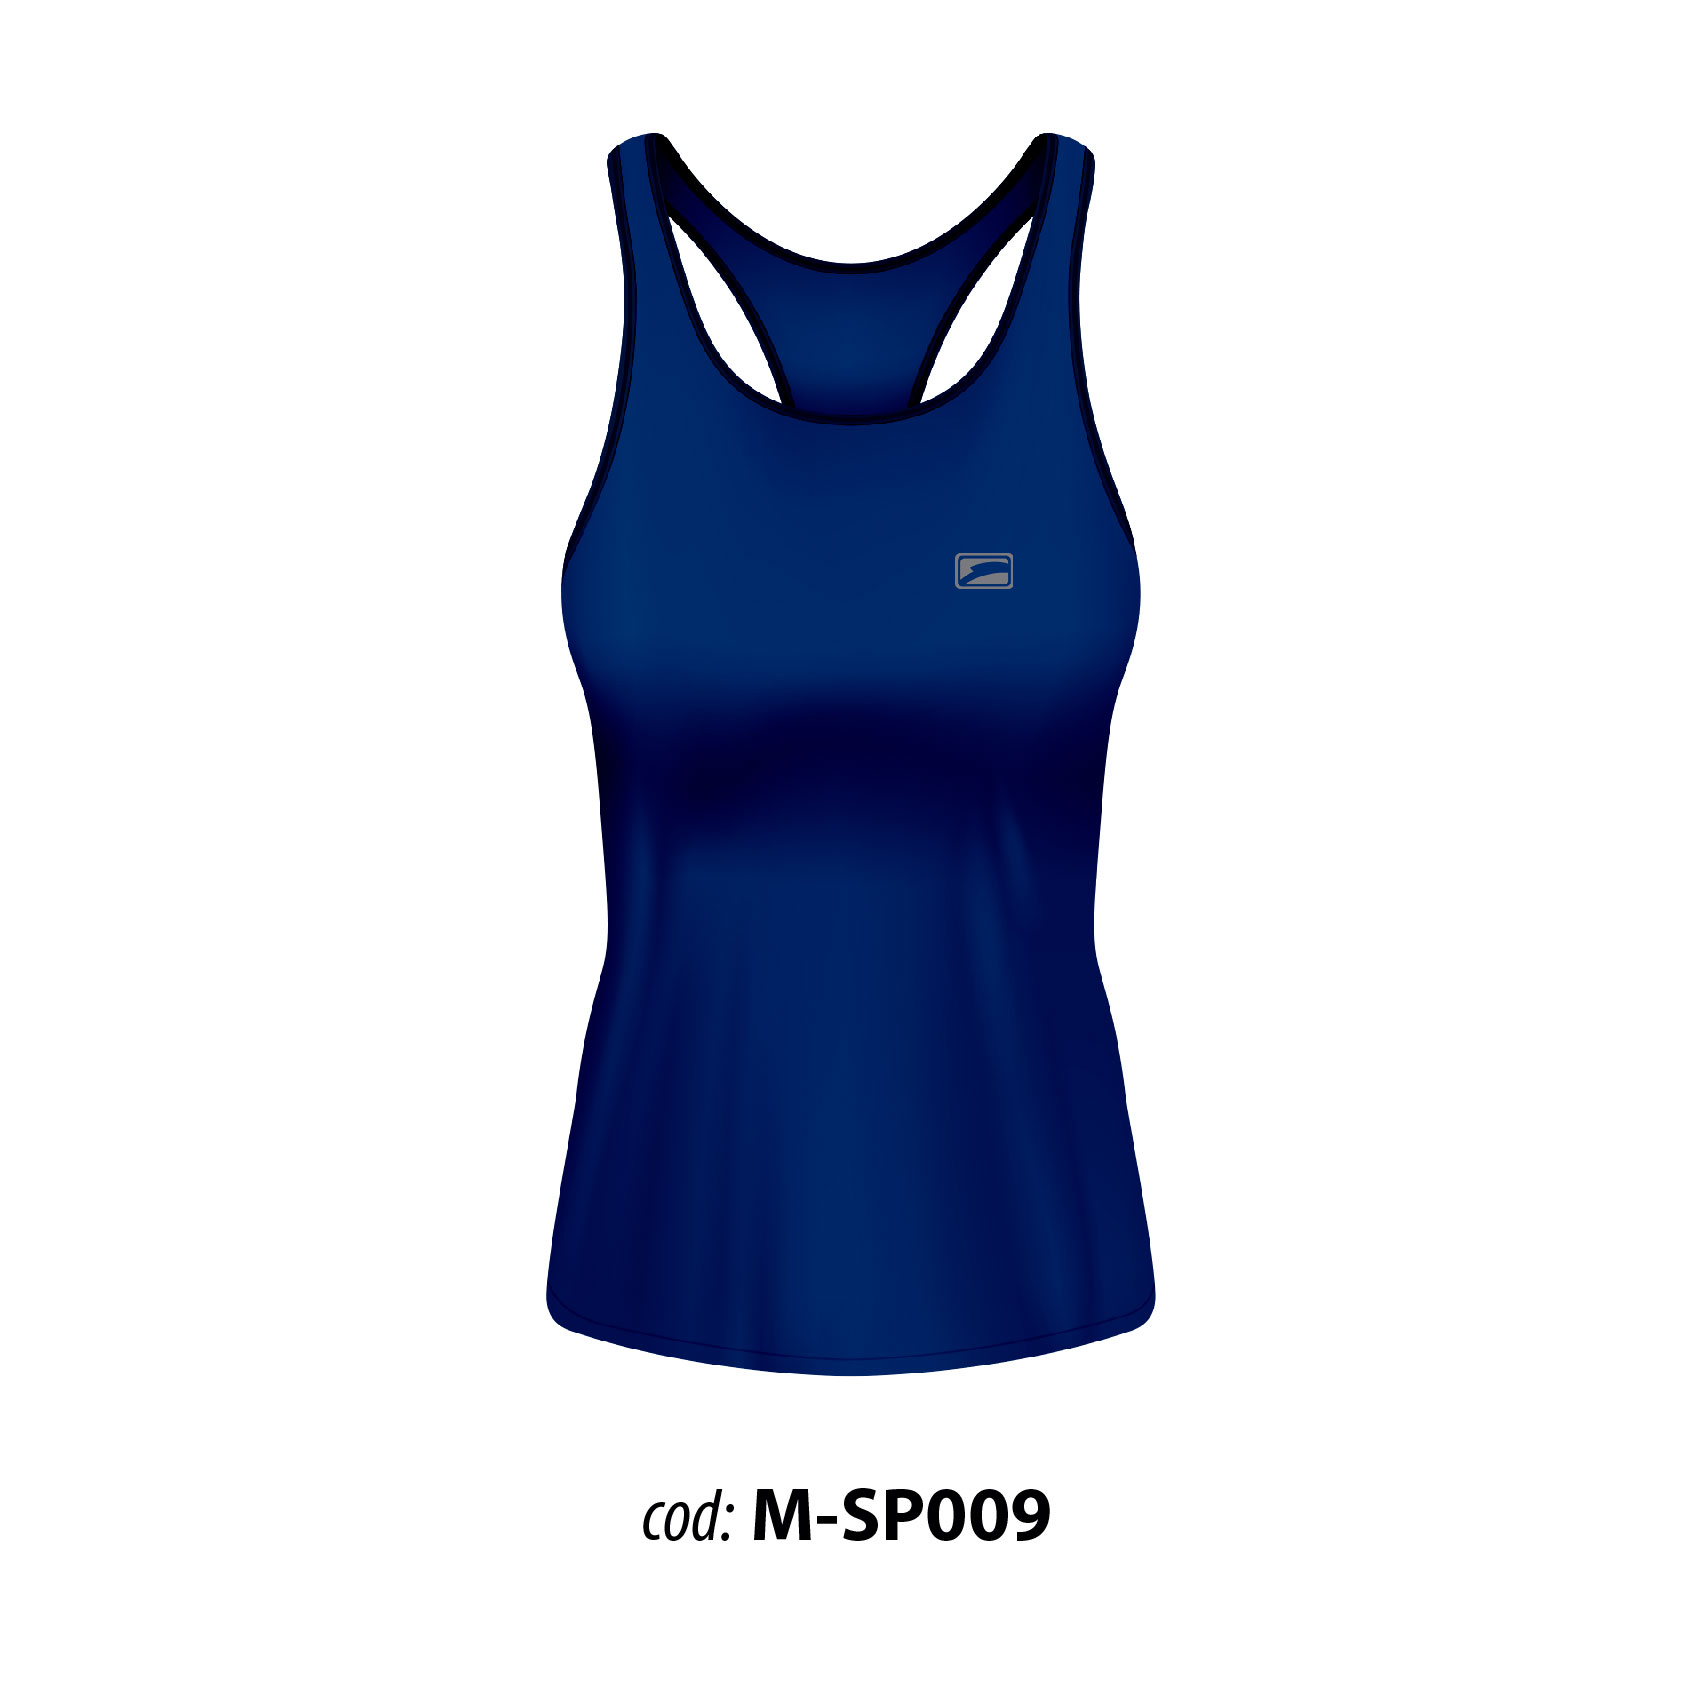 Sudadera Run Dama M-SP009